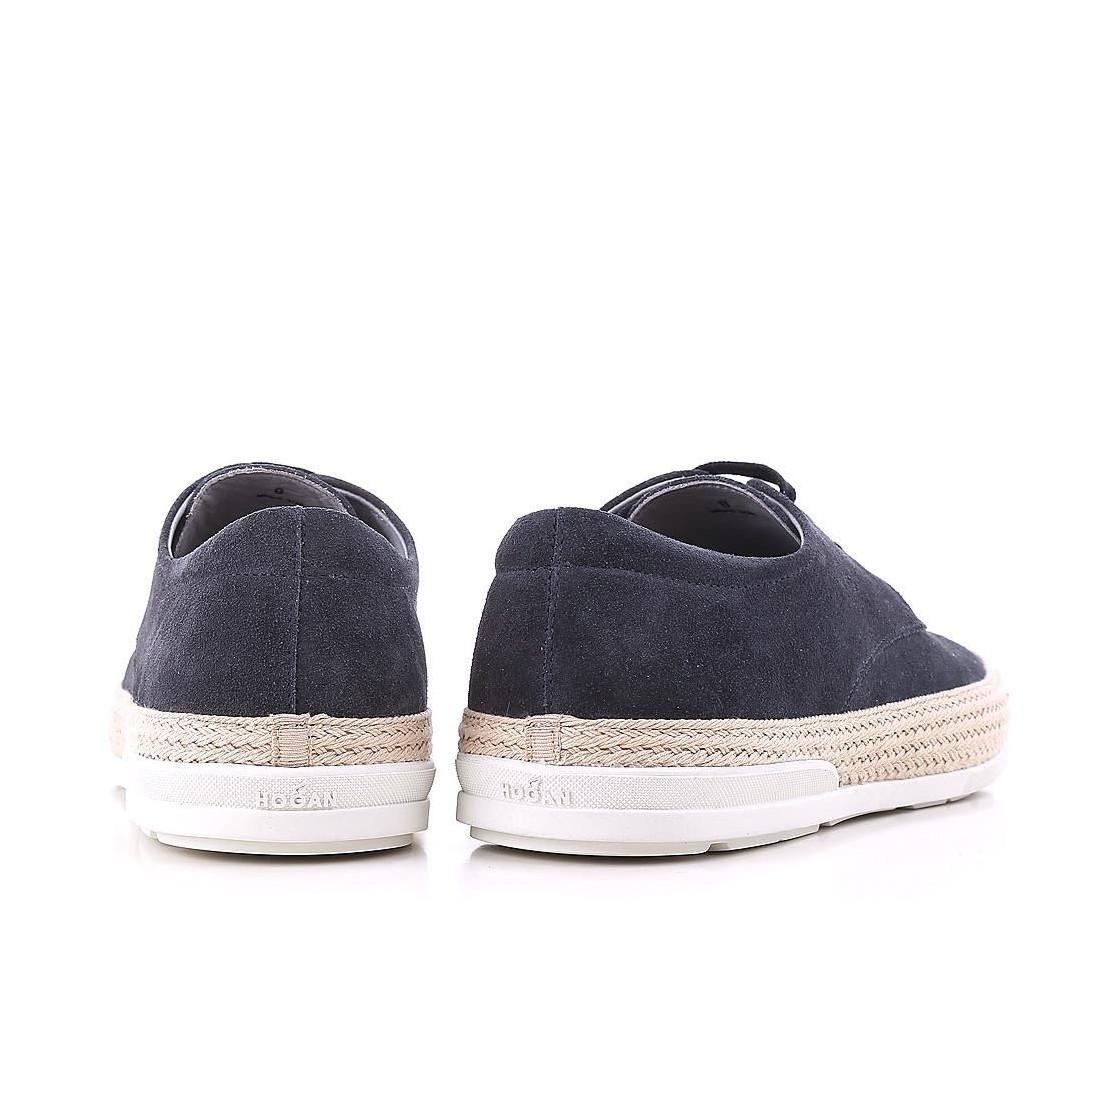 sneakers man hogan hxm3580af50hg0u805 3064